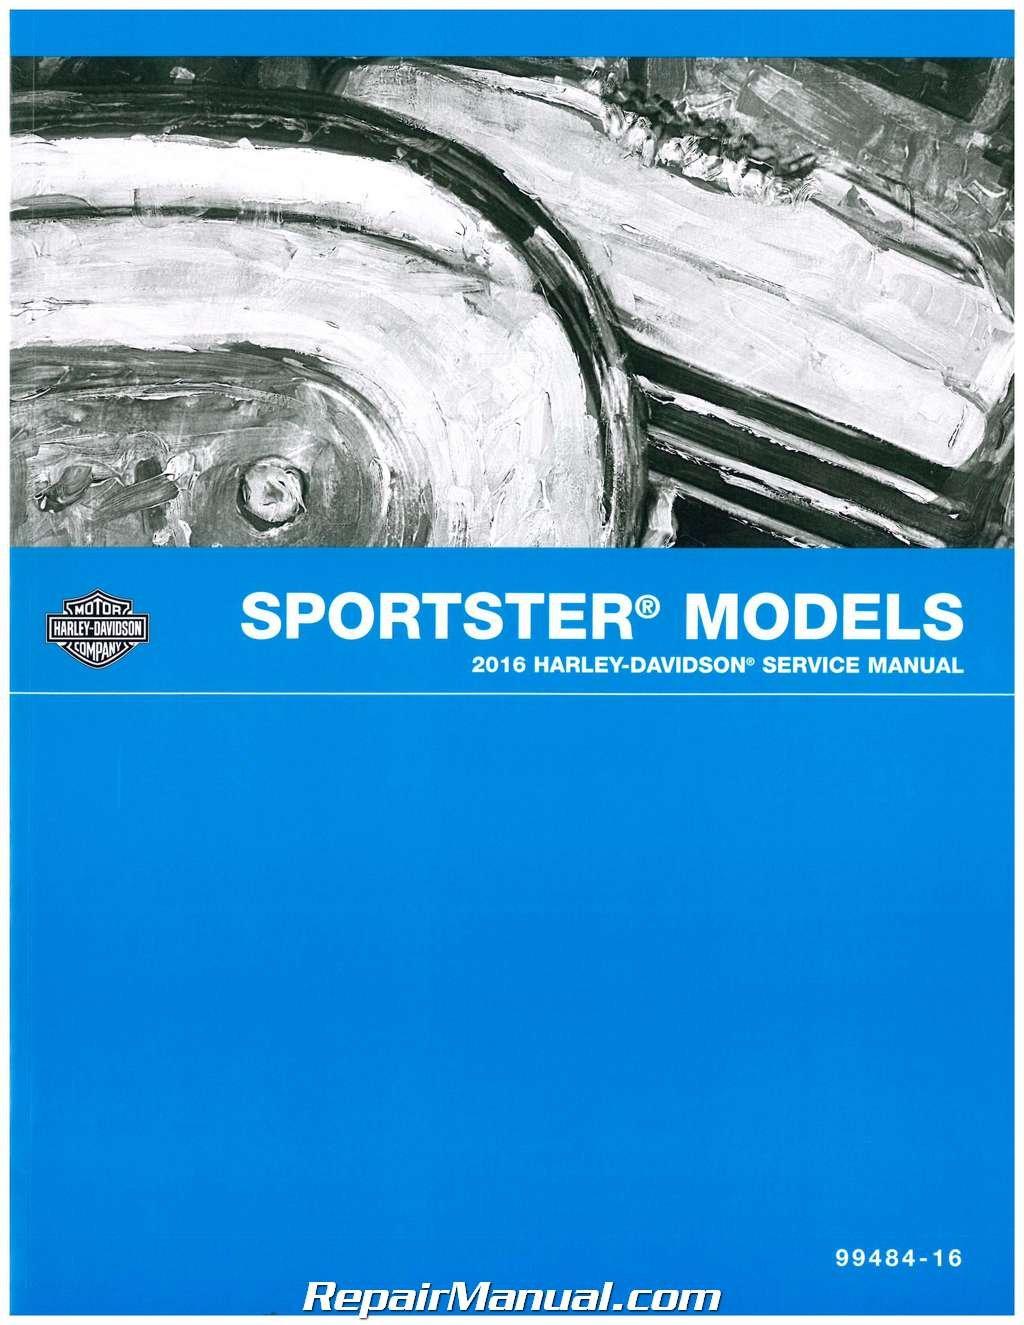 Harley-davidson sportster motorcycle (2004-2013) service repair manual.